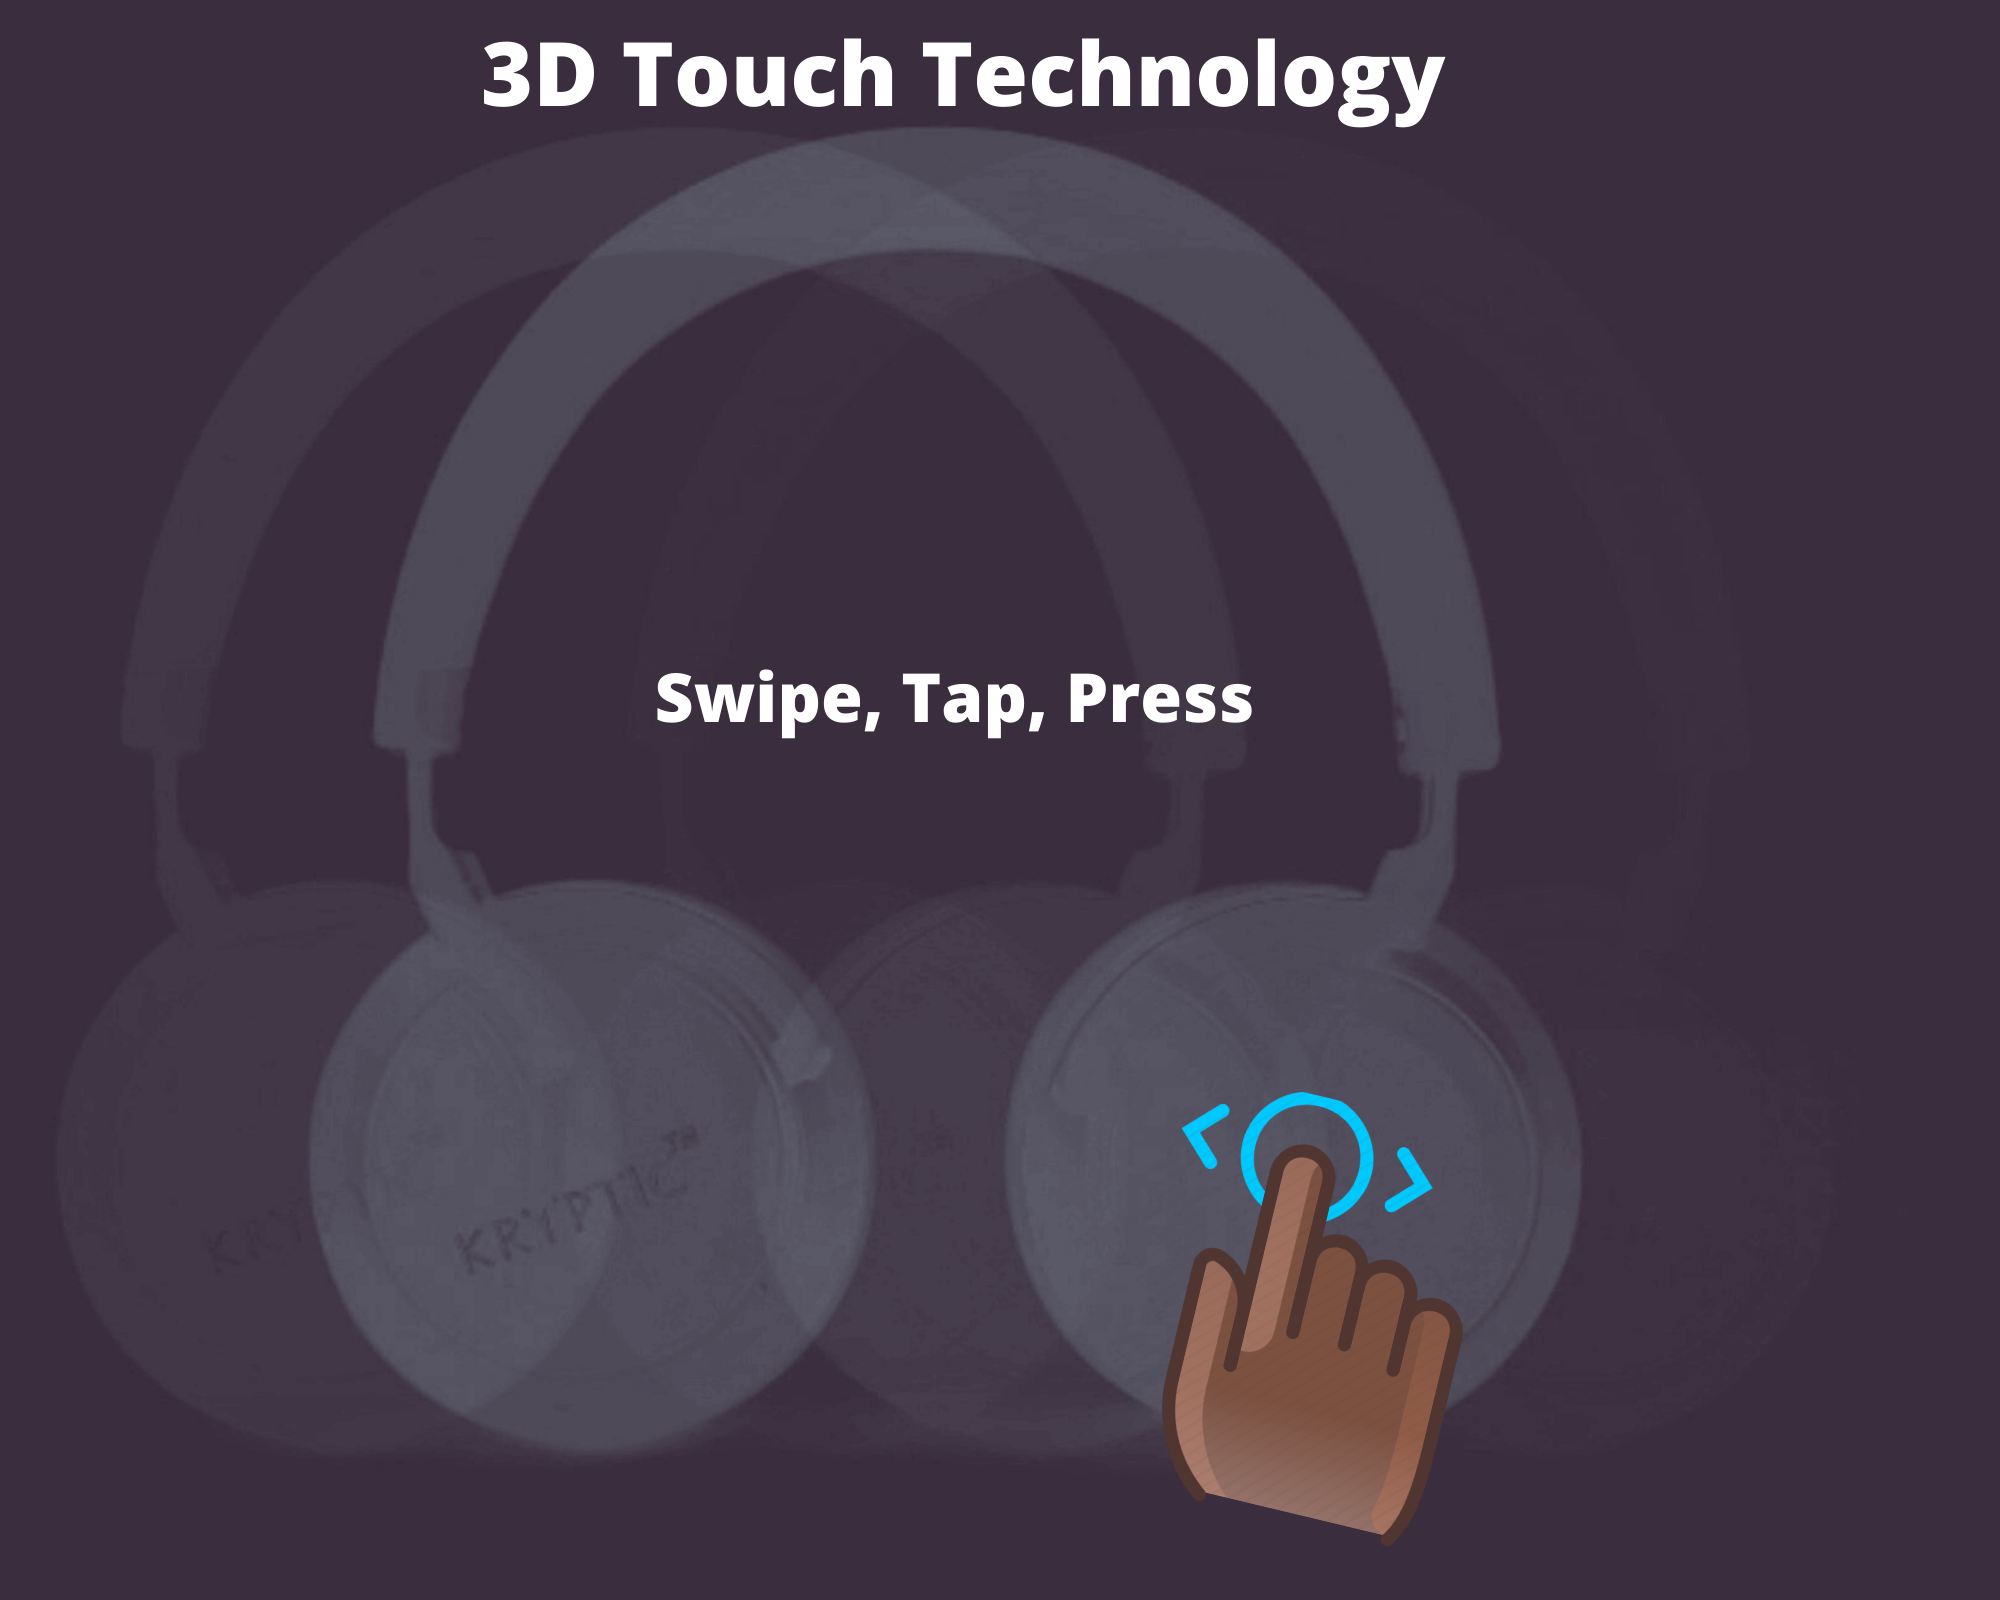 Swipe, Tap, Press